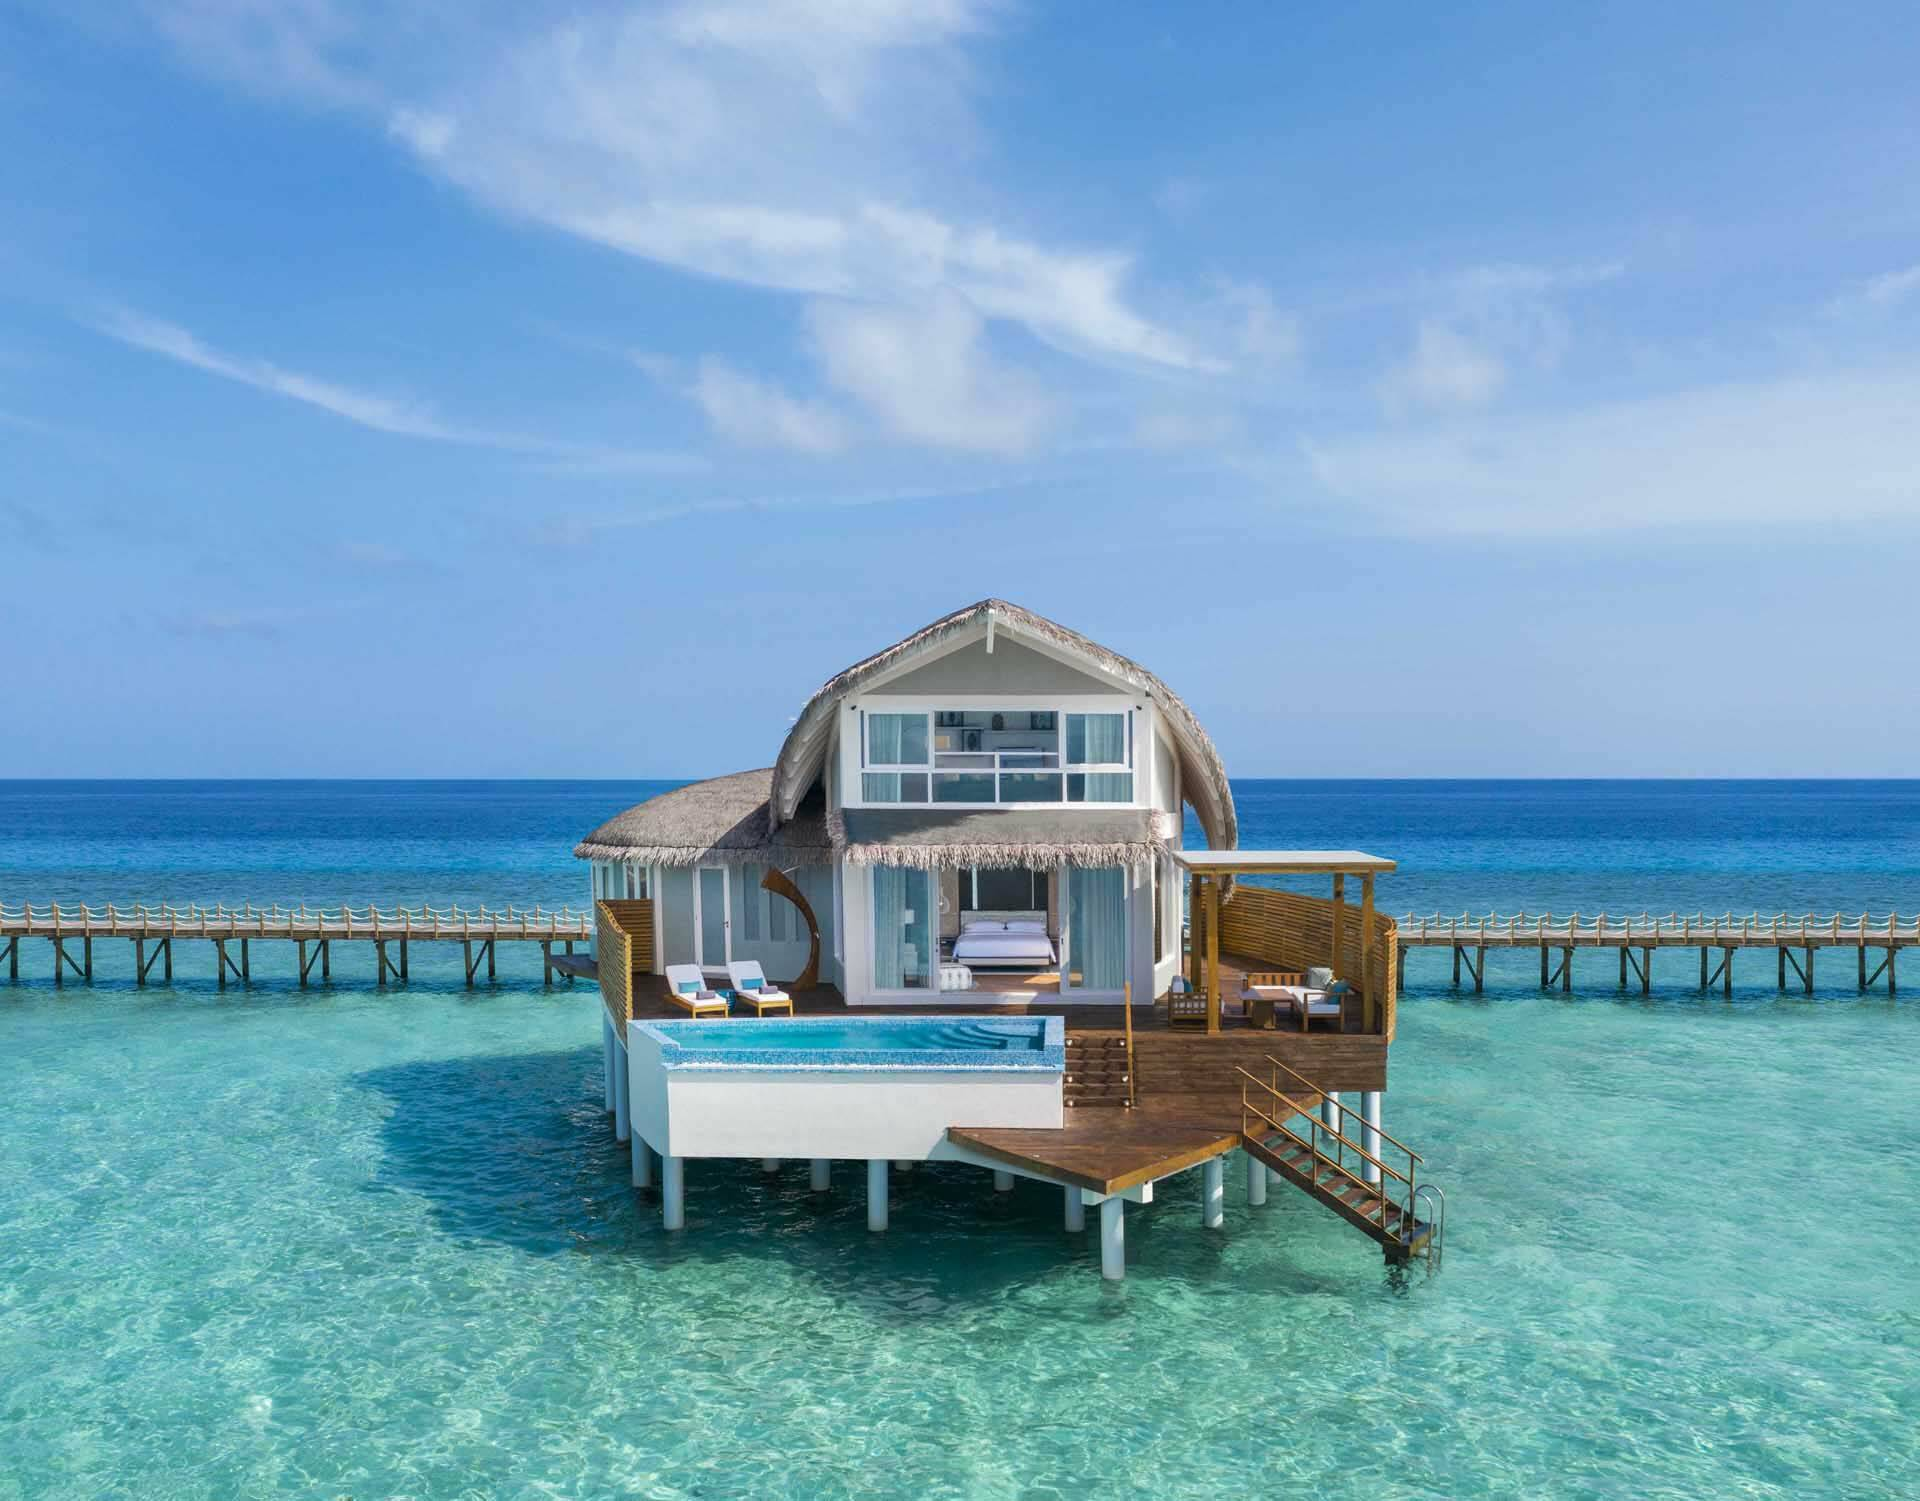 JW Marriott Maldives overwater pool villa